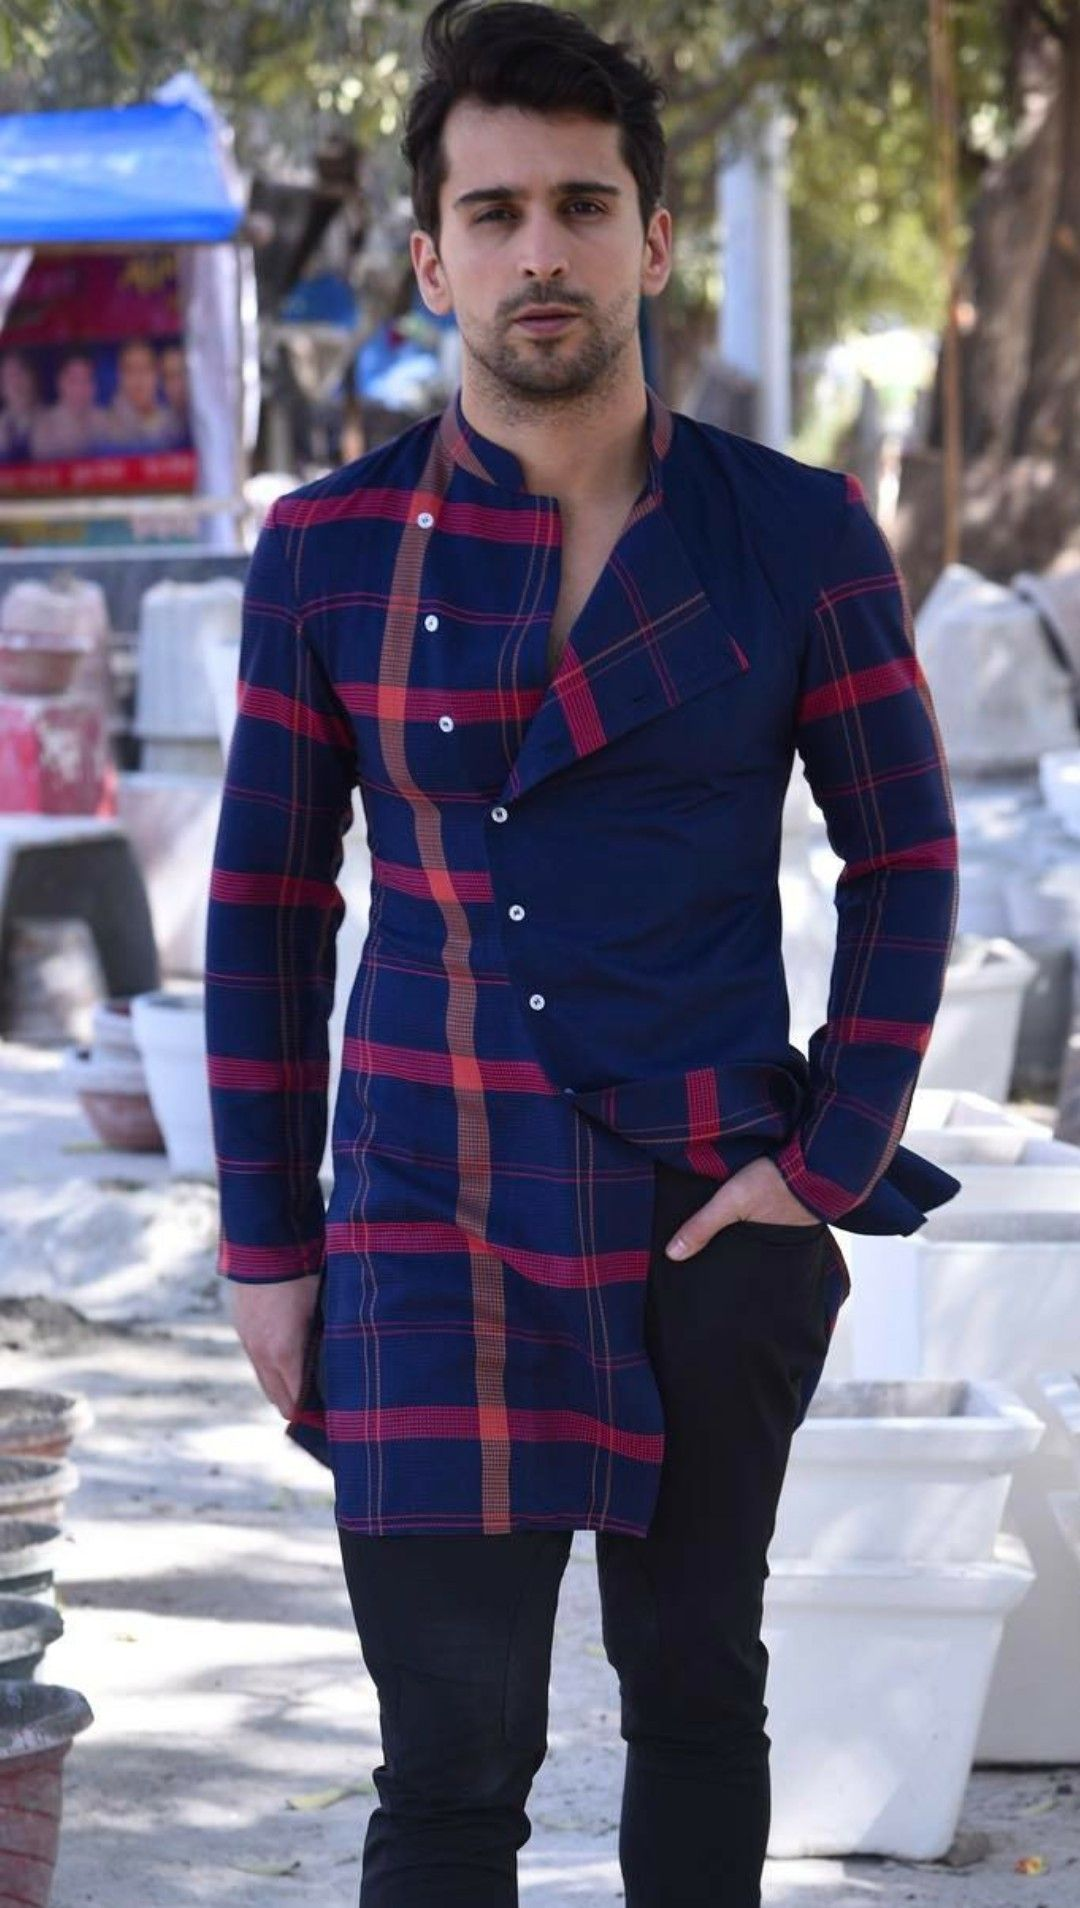 545807662eb 100 Miles Nirvana Pure Cotton Kurtis (8 pc catalog) #kurtis #cotton_kurtis  #khadi_kurtis #fashion #designer #indian_fashion #ootd #classy #stylish ...